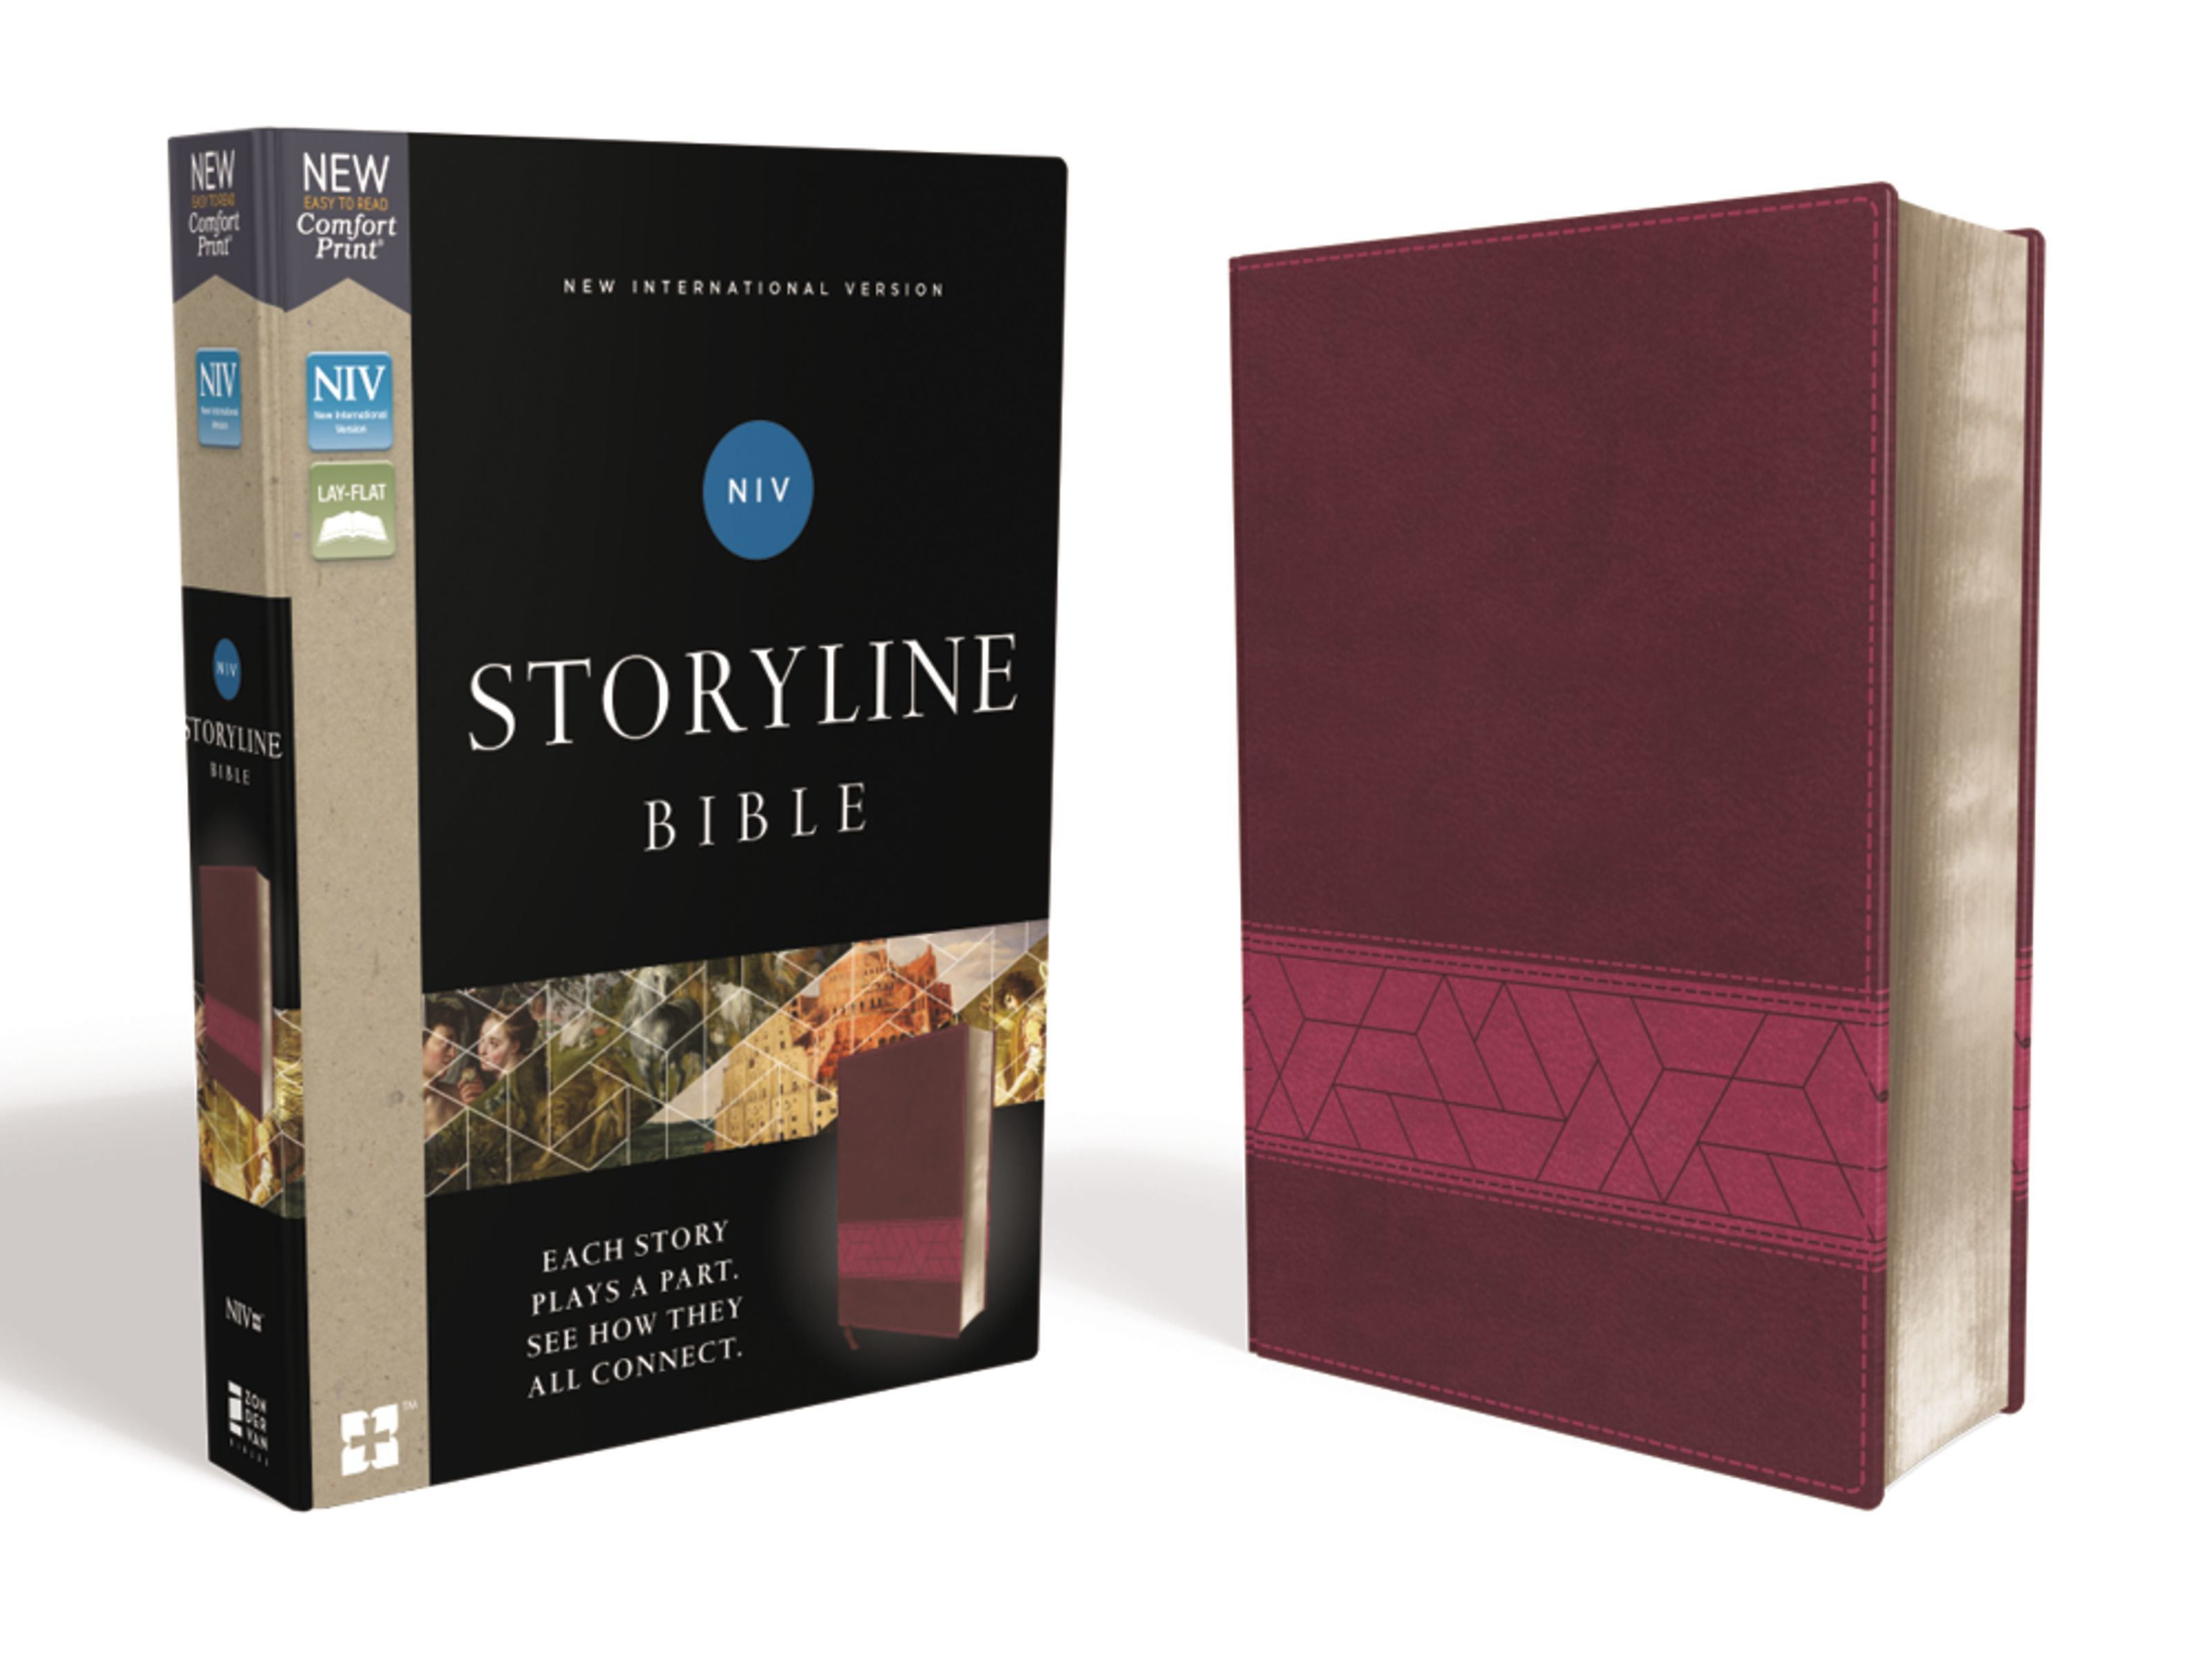 NIV Storyline Bible- Pink